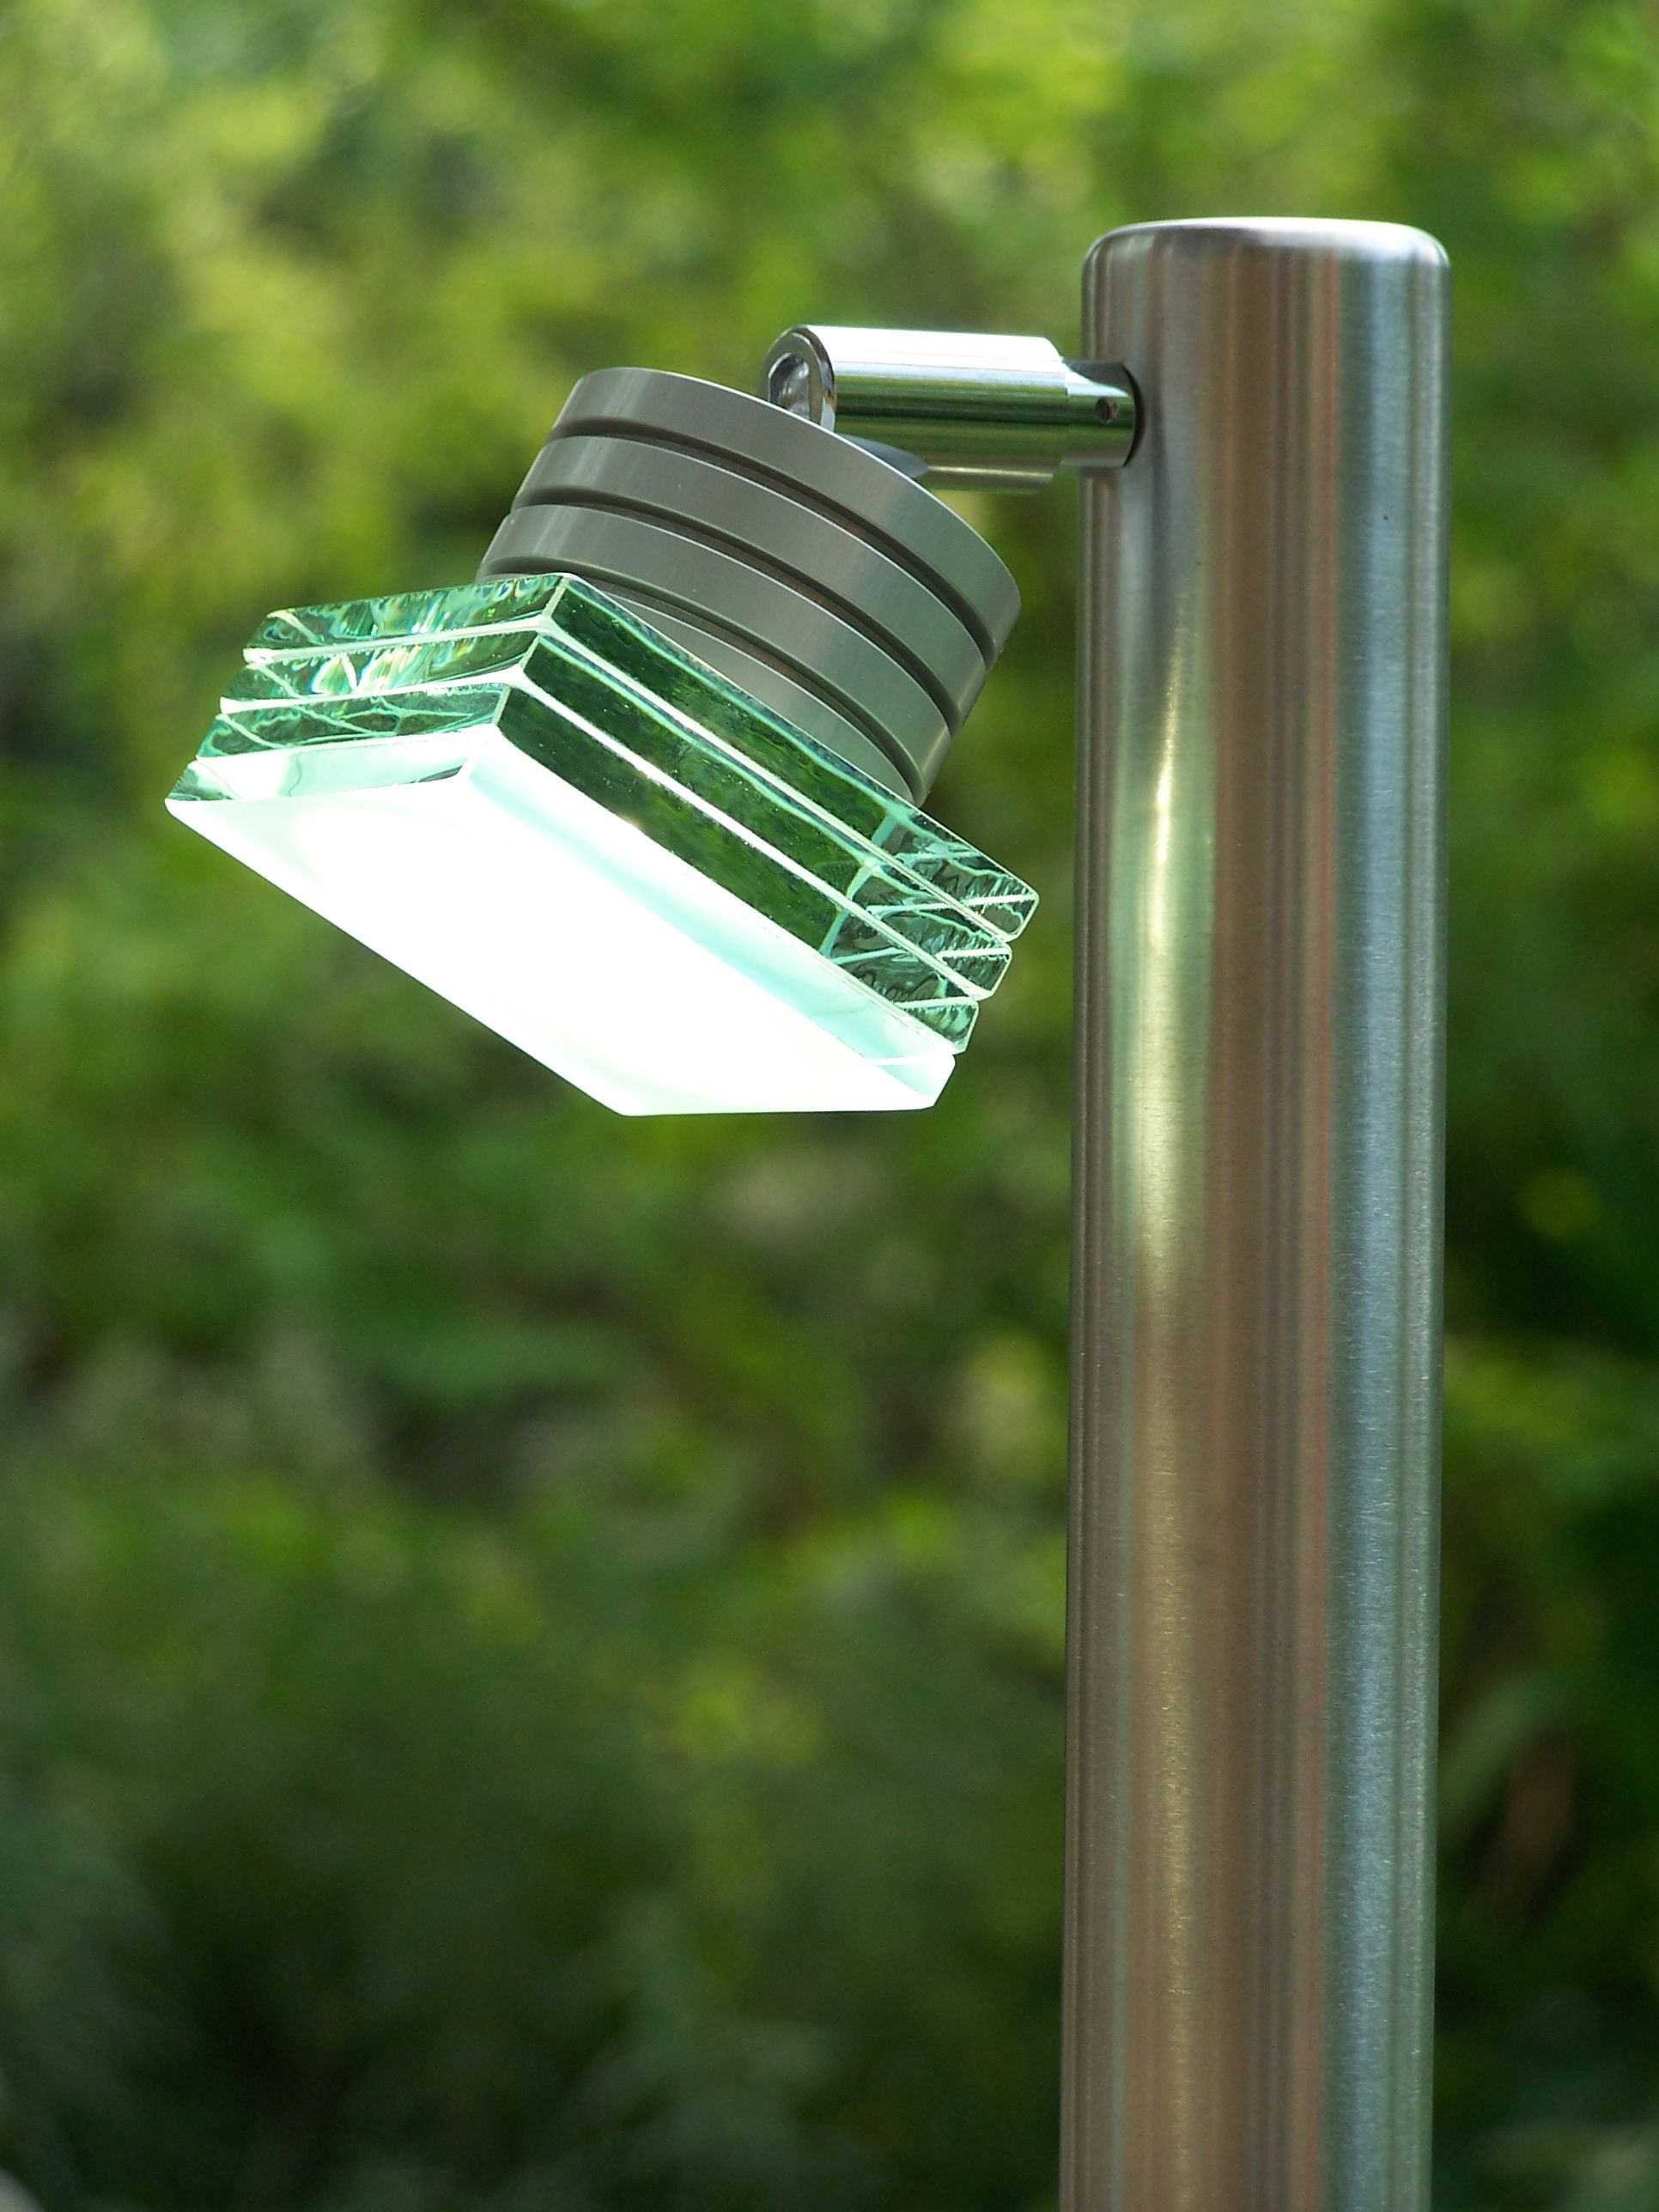 Fully adjustable led stainless steel border light for Driveway landscape lighting